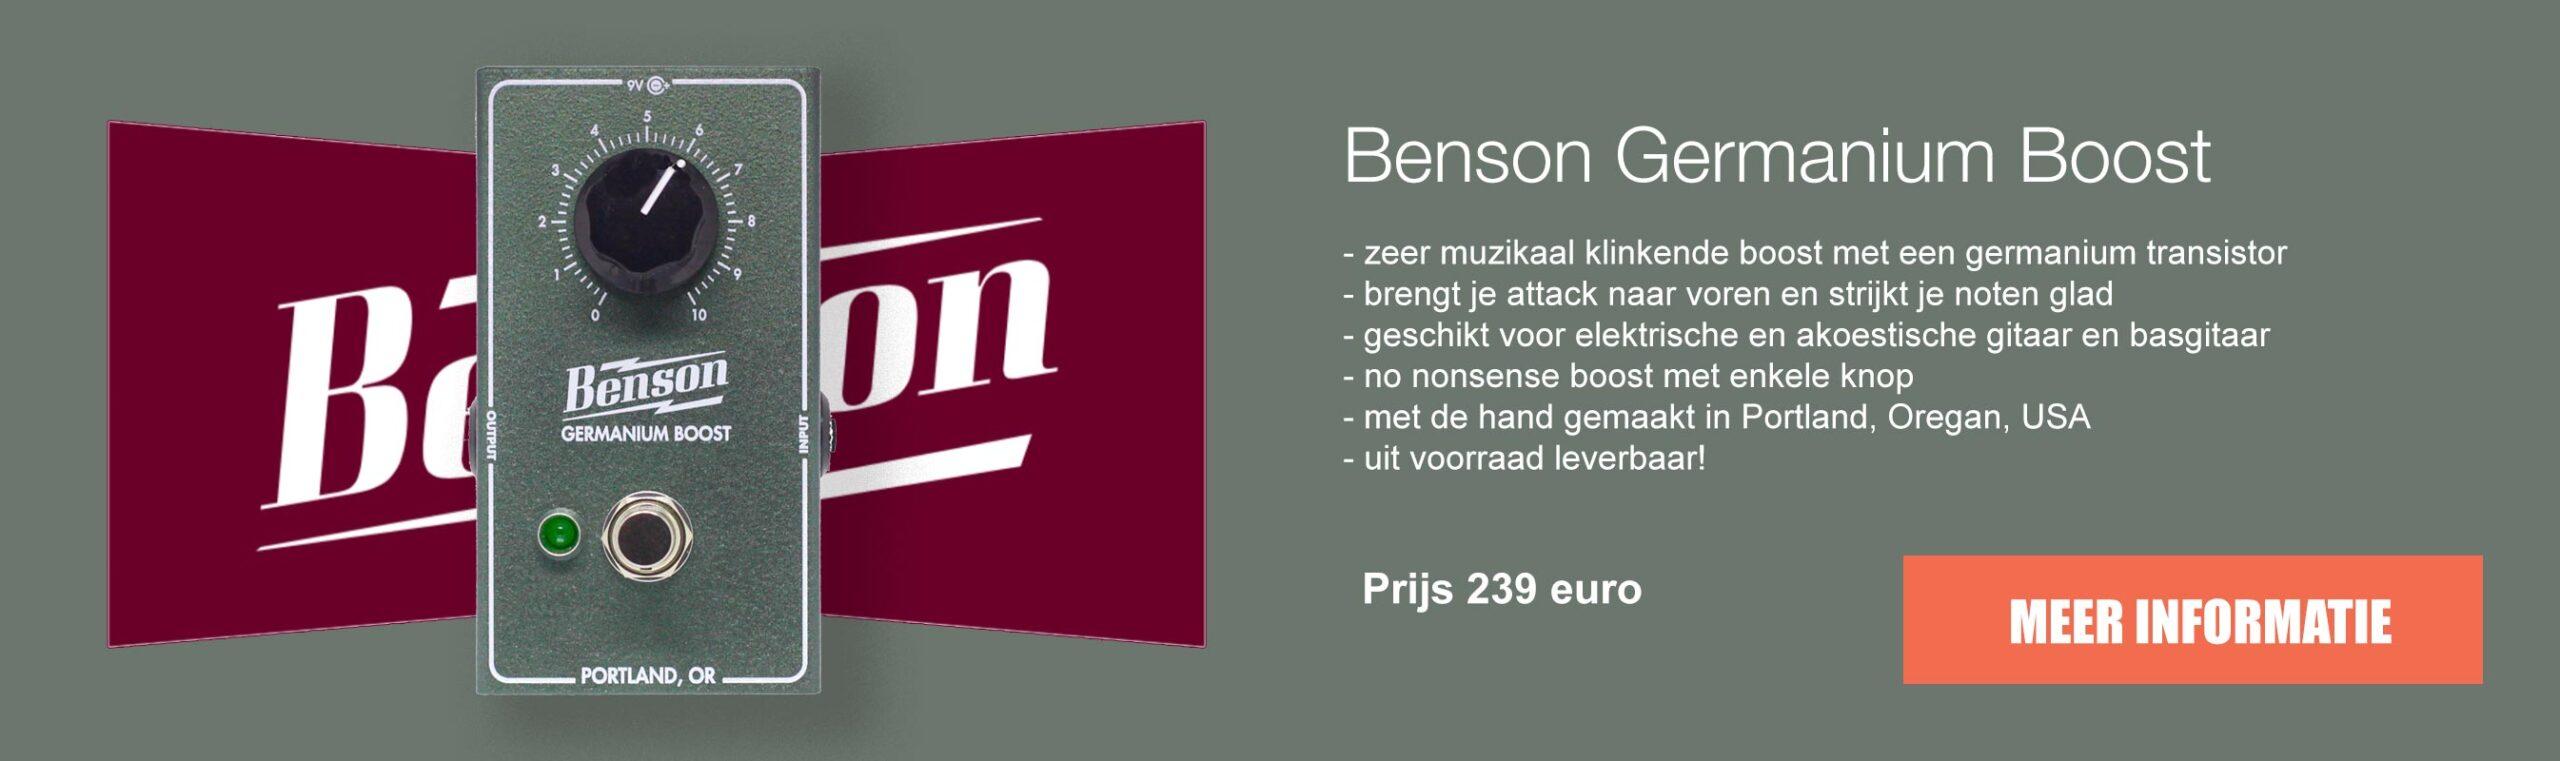 Benson_Germanium_Boost